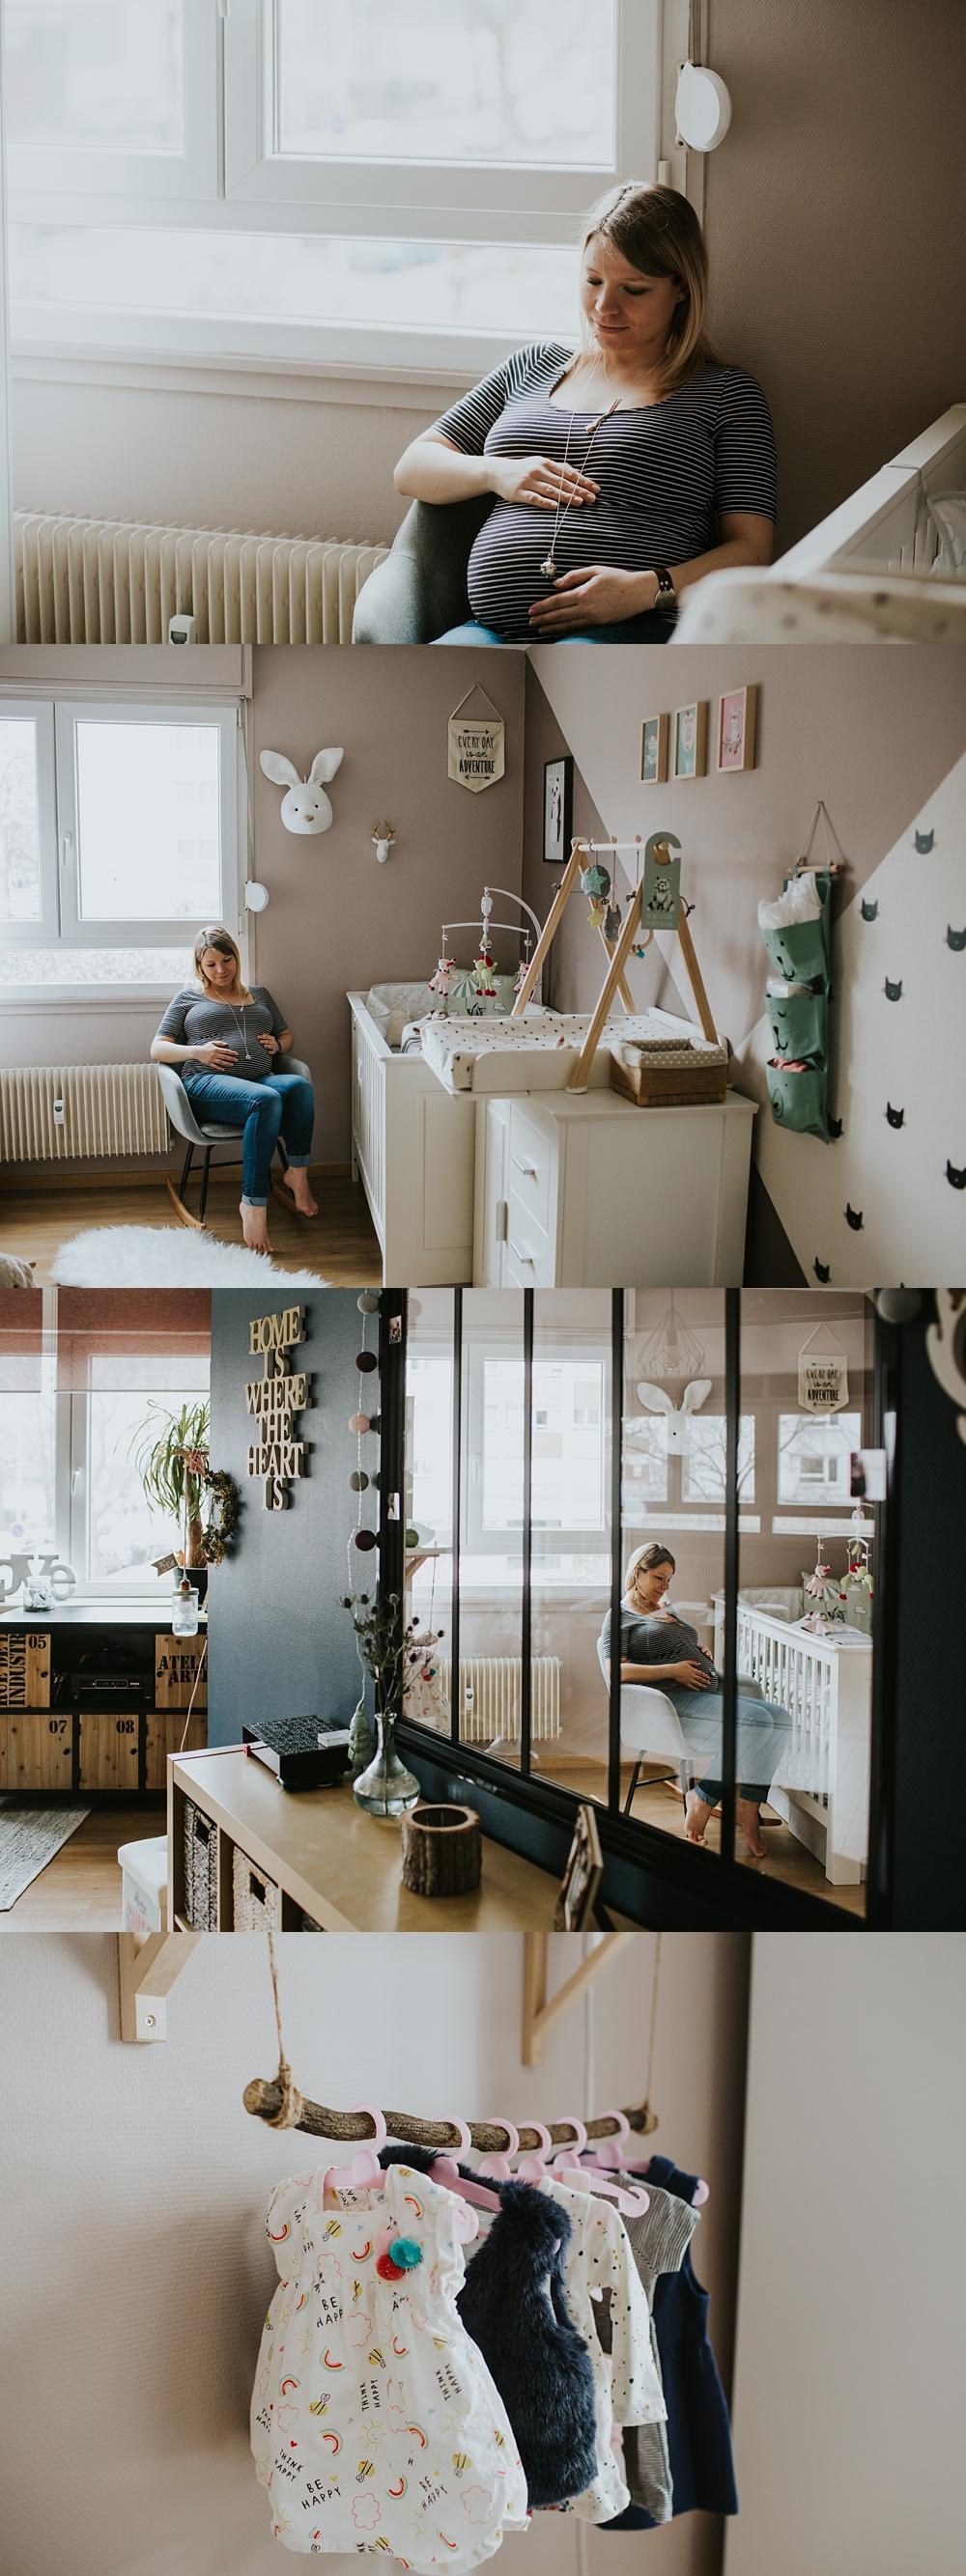 Photographe maternité Strasbourg Alsace